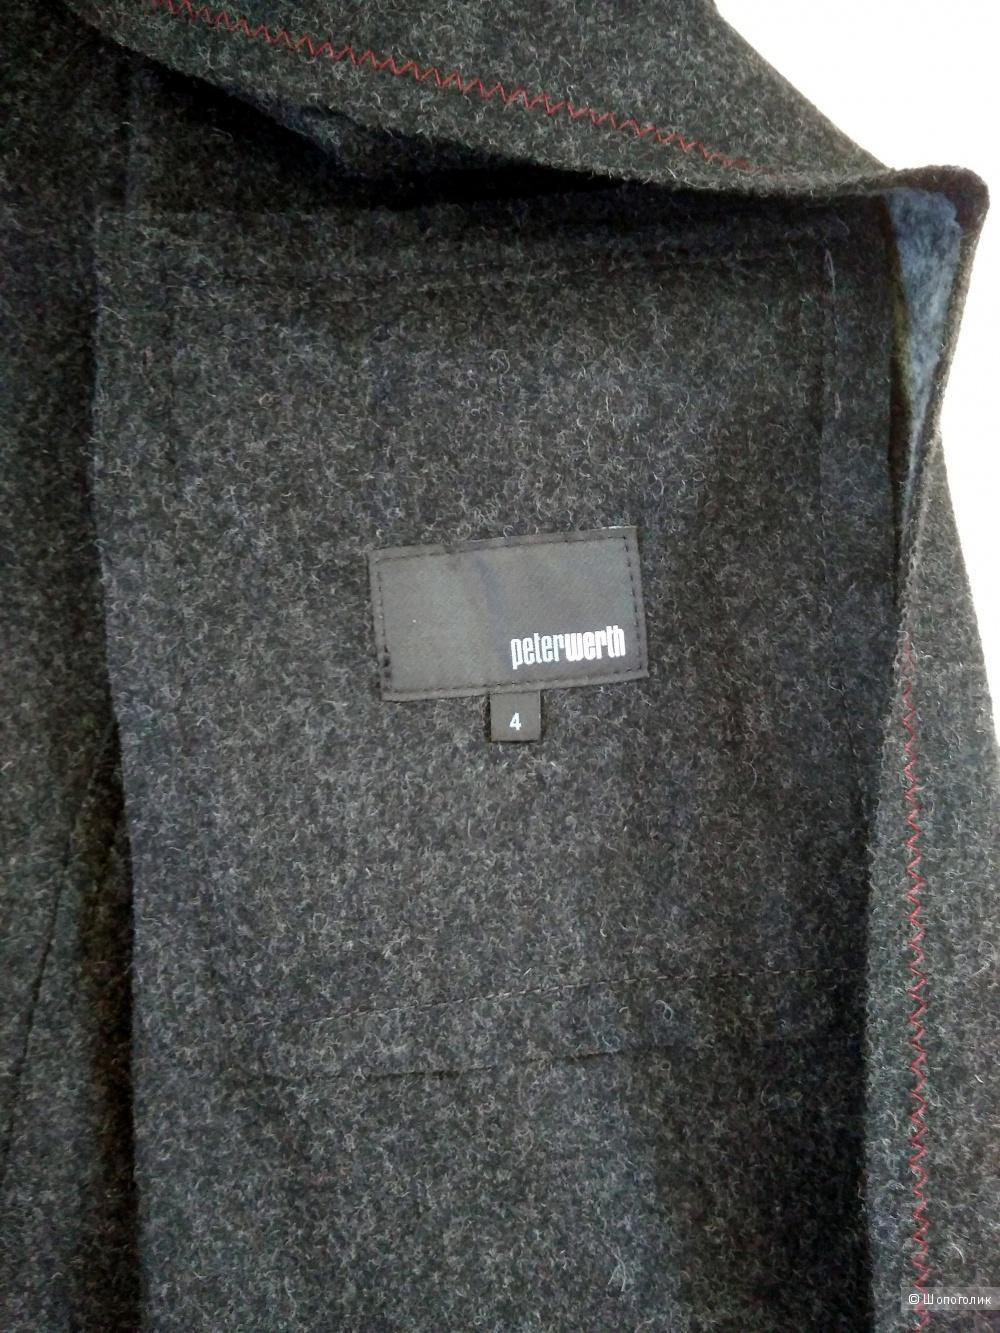 Мужская дизайнерская куртка-полупальто PETER WERTH р52